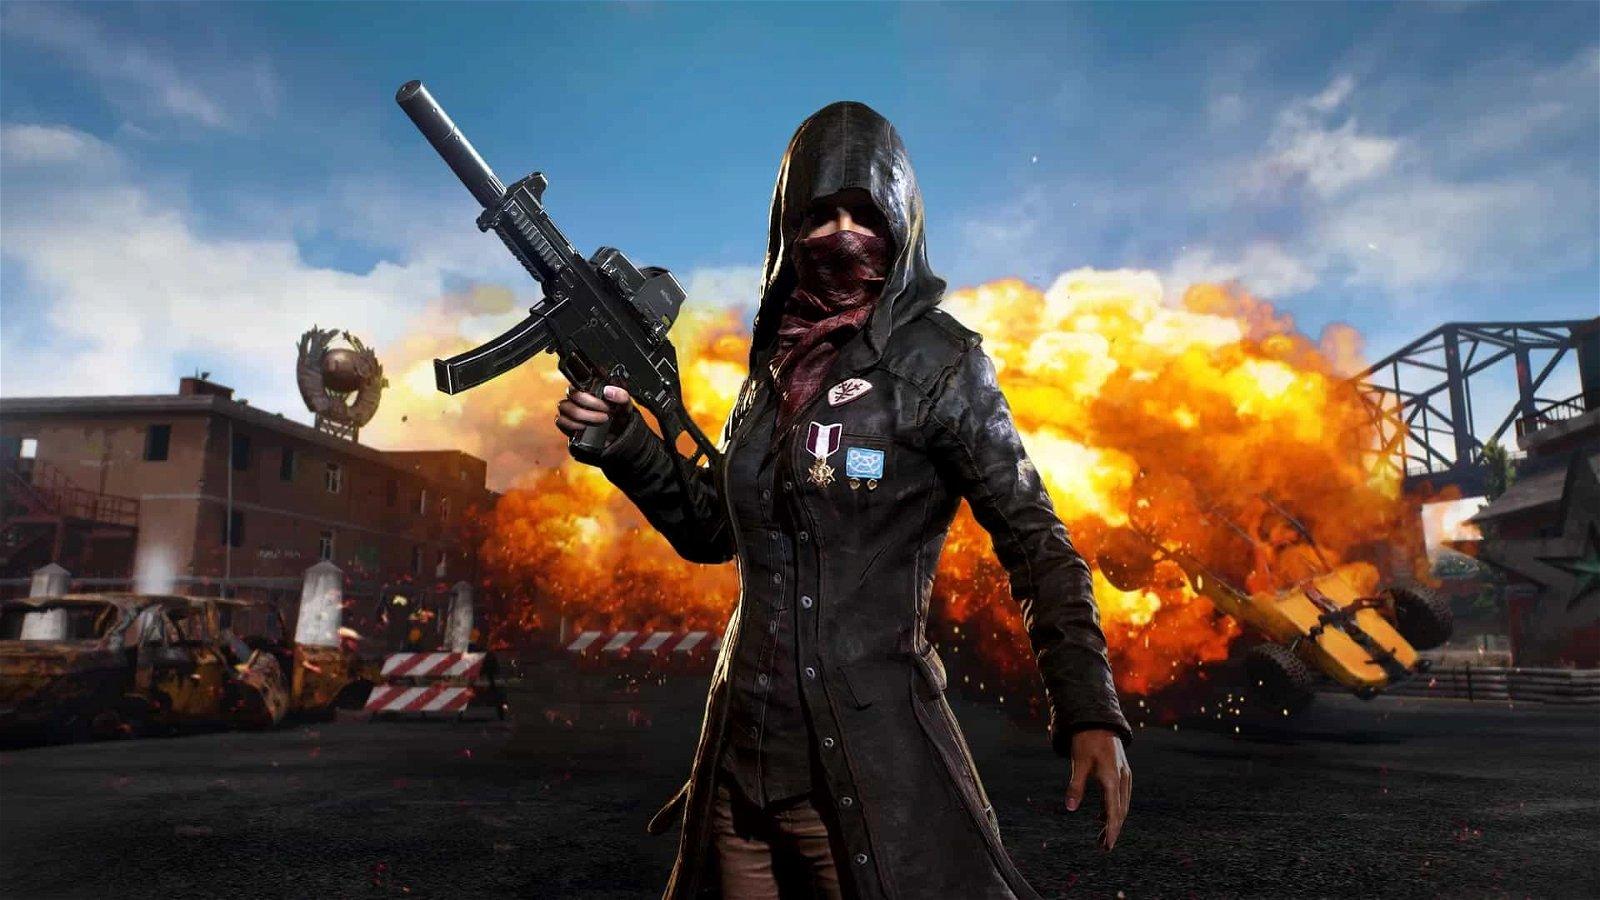 Story Content Inbound From New PlayerUnknown's Battlegrounds Studio 1